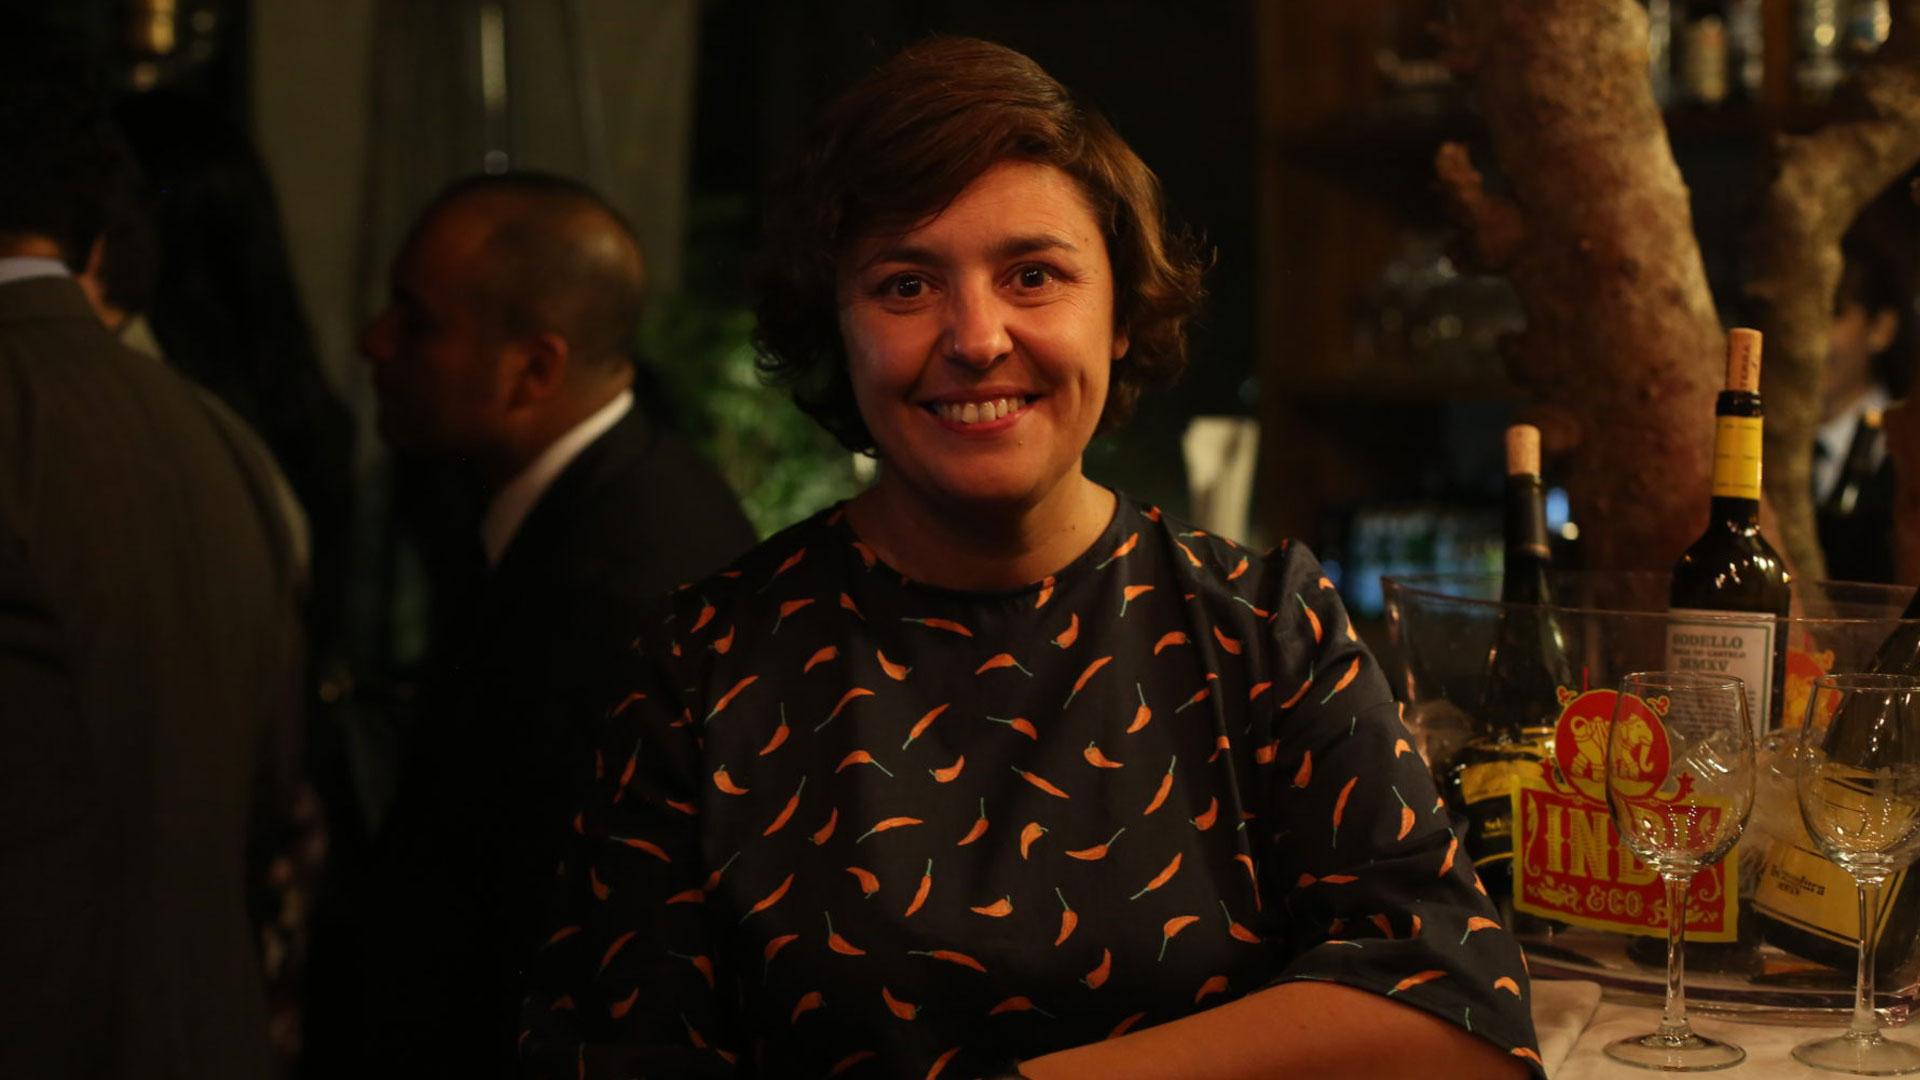 Cristina Alcalá: autenticidad de la viticultura gallega